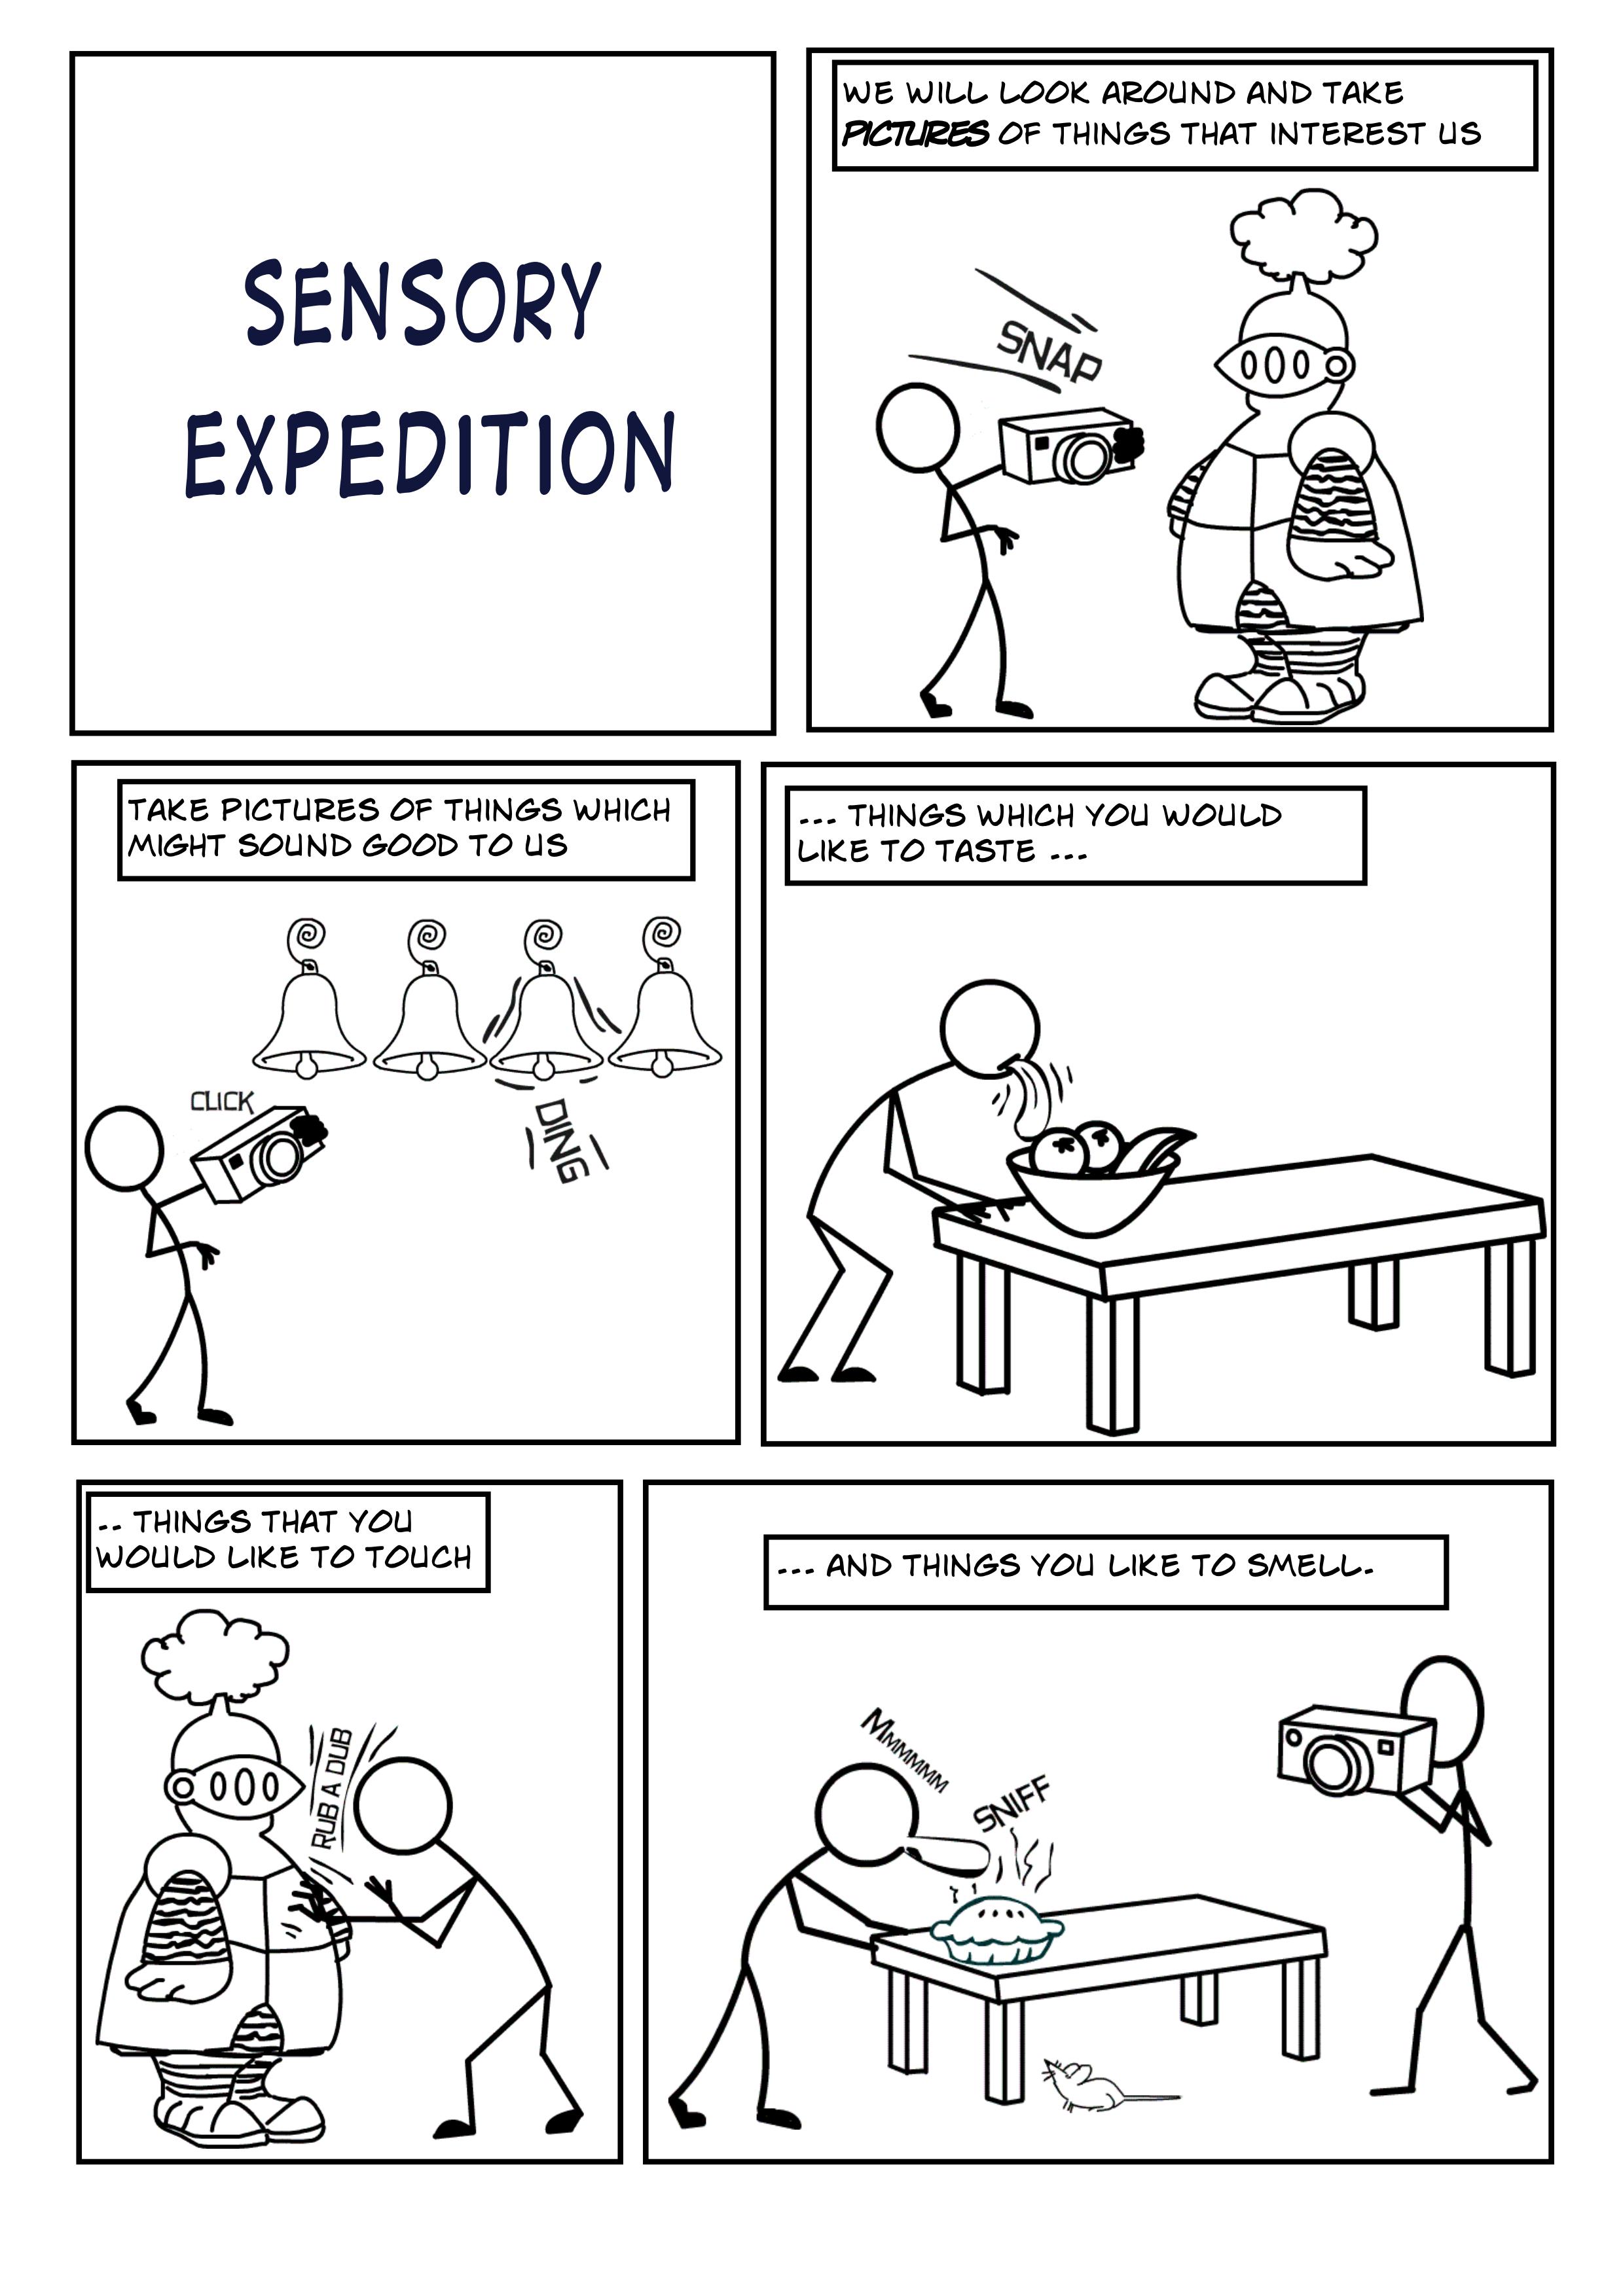 SensoryExpeditionVer2